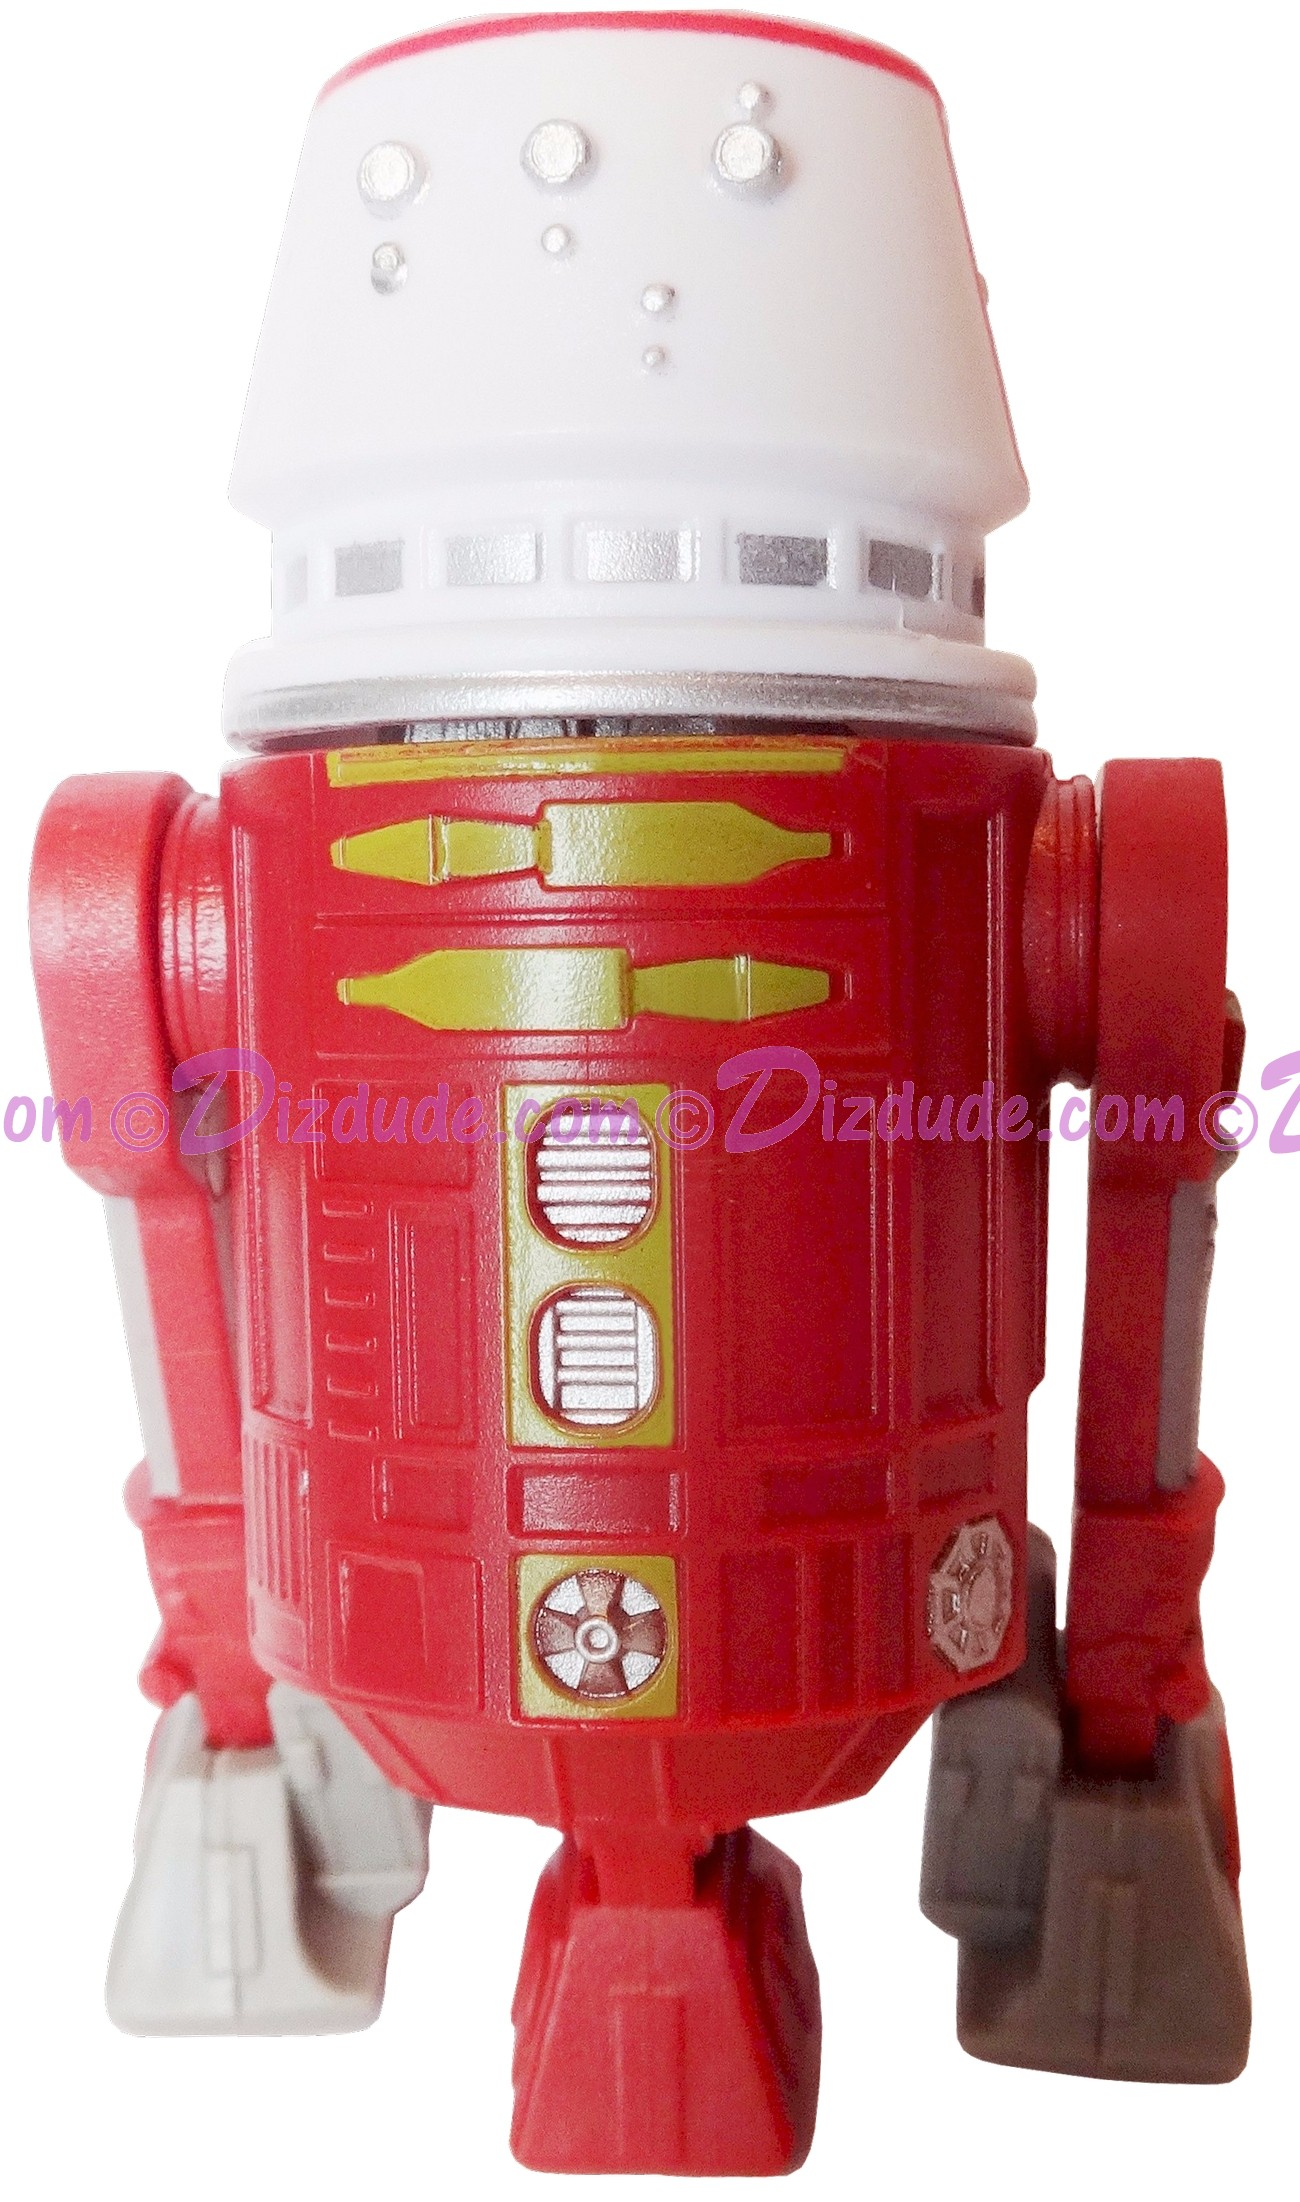 R5 Dark Red Astromech Droid ~ Pick-A-Hat ~ Series 2 from Disney Star Wars Build-A-Droid Factory © Dizdude.com